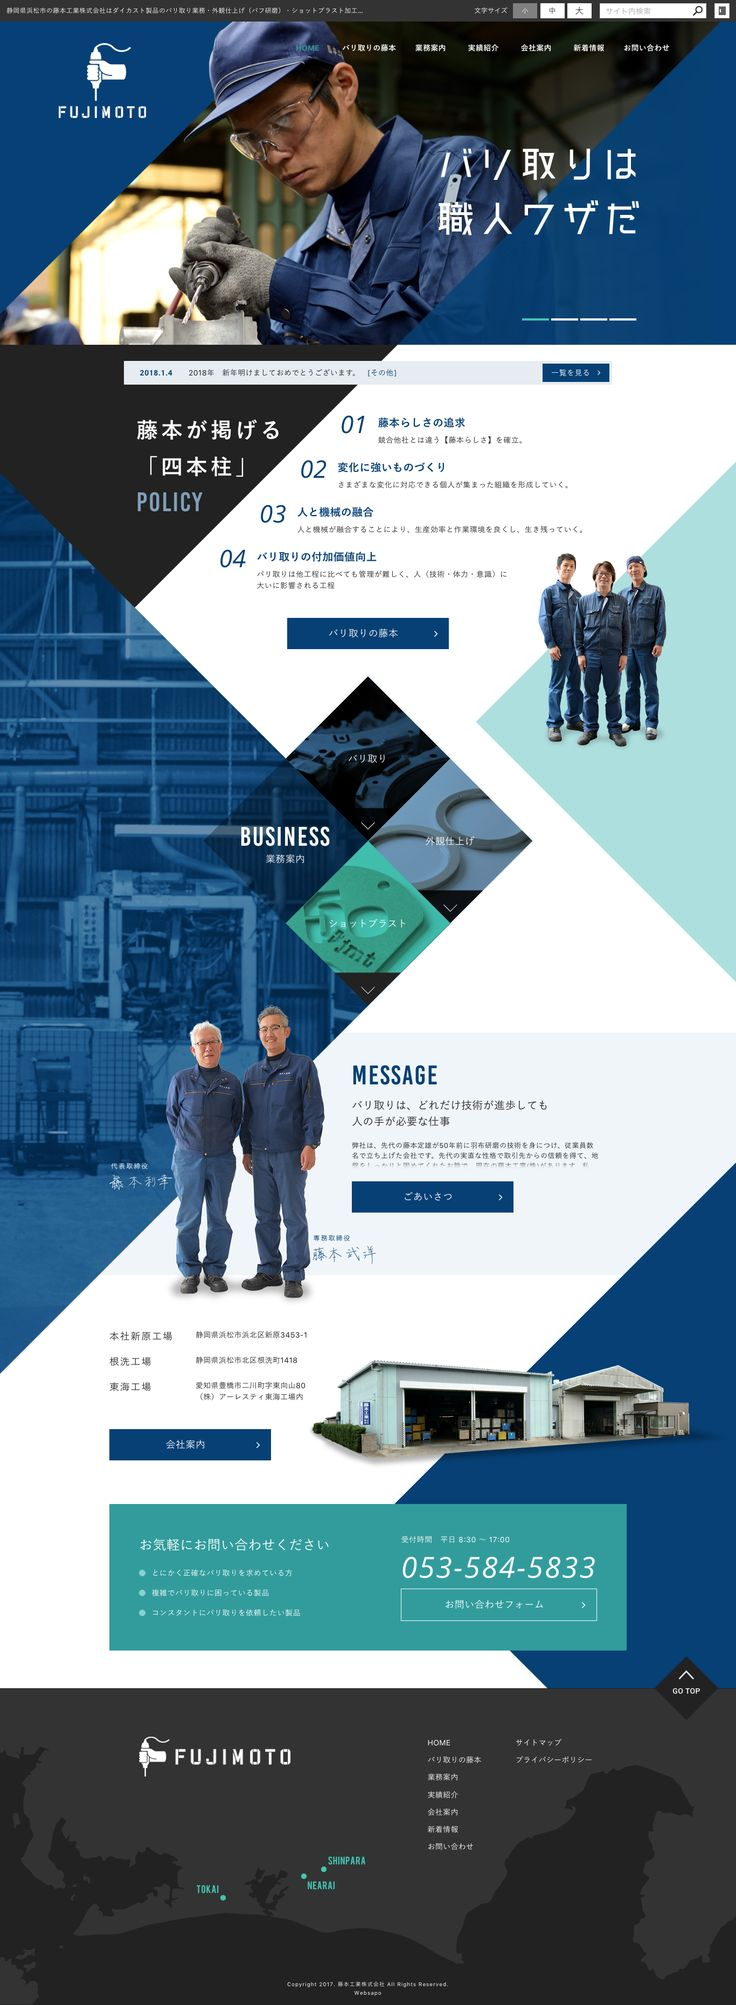 web design / japan / 職人 / 藤本工業